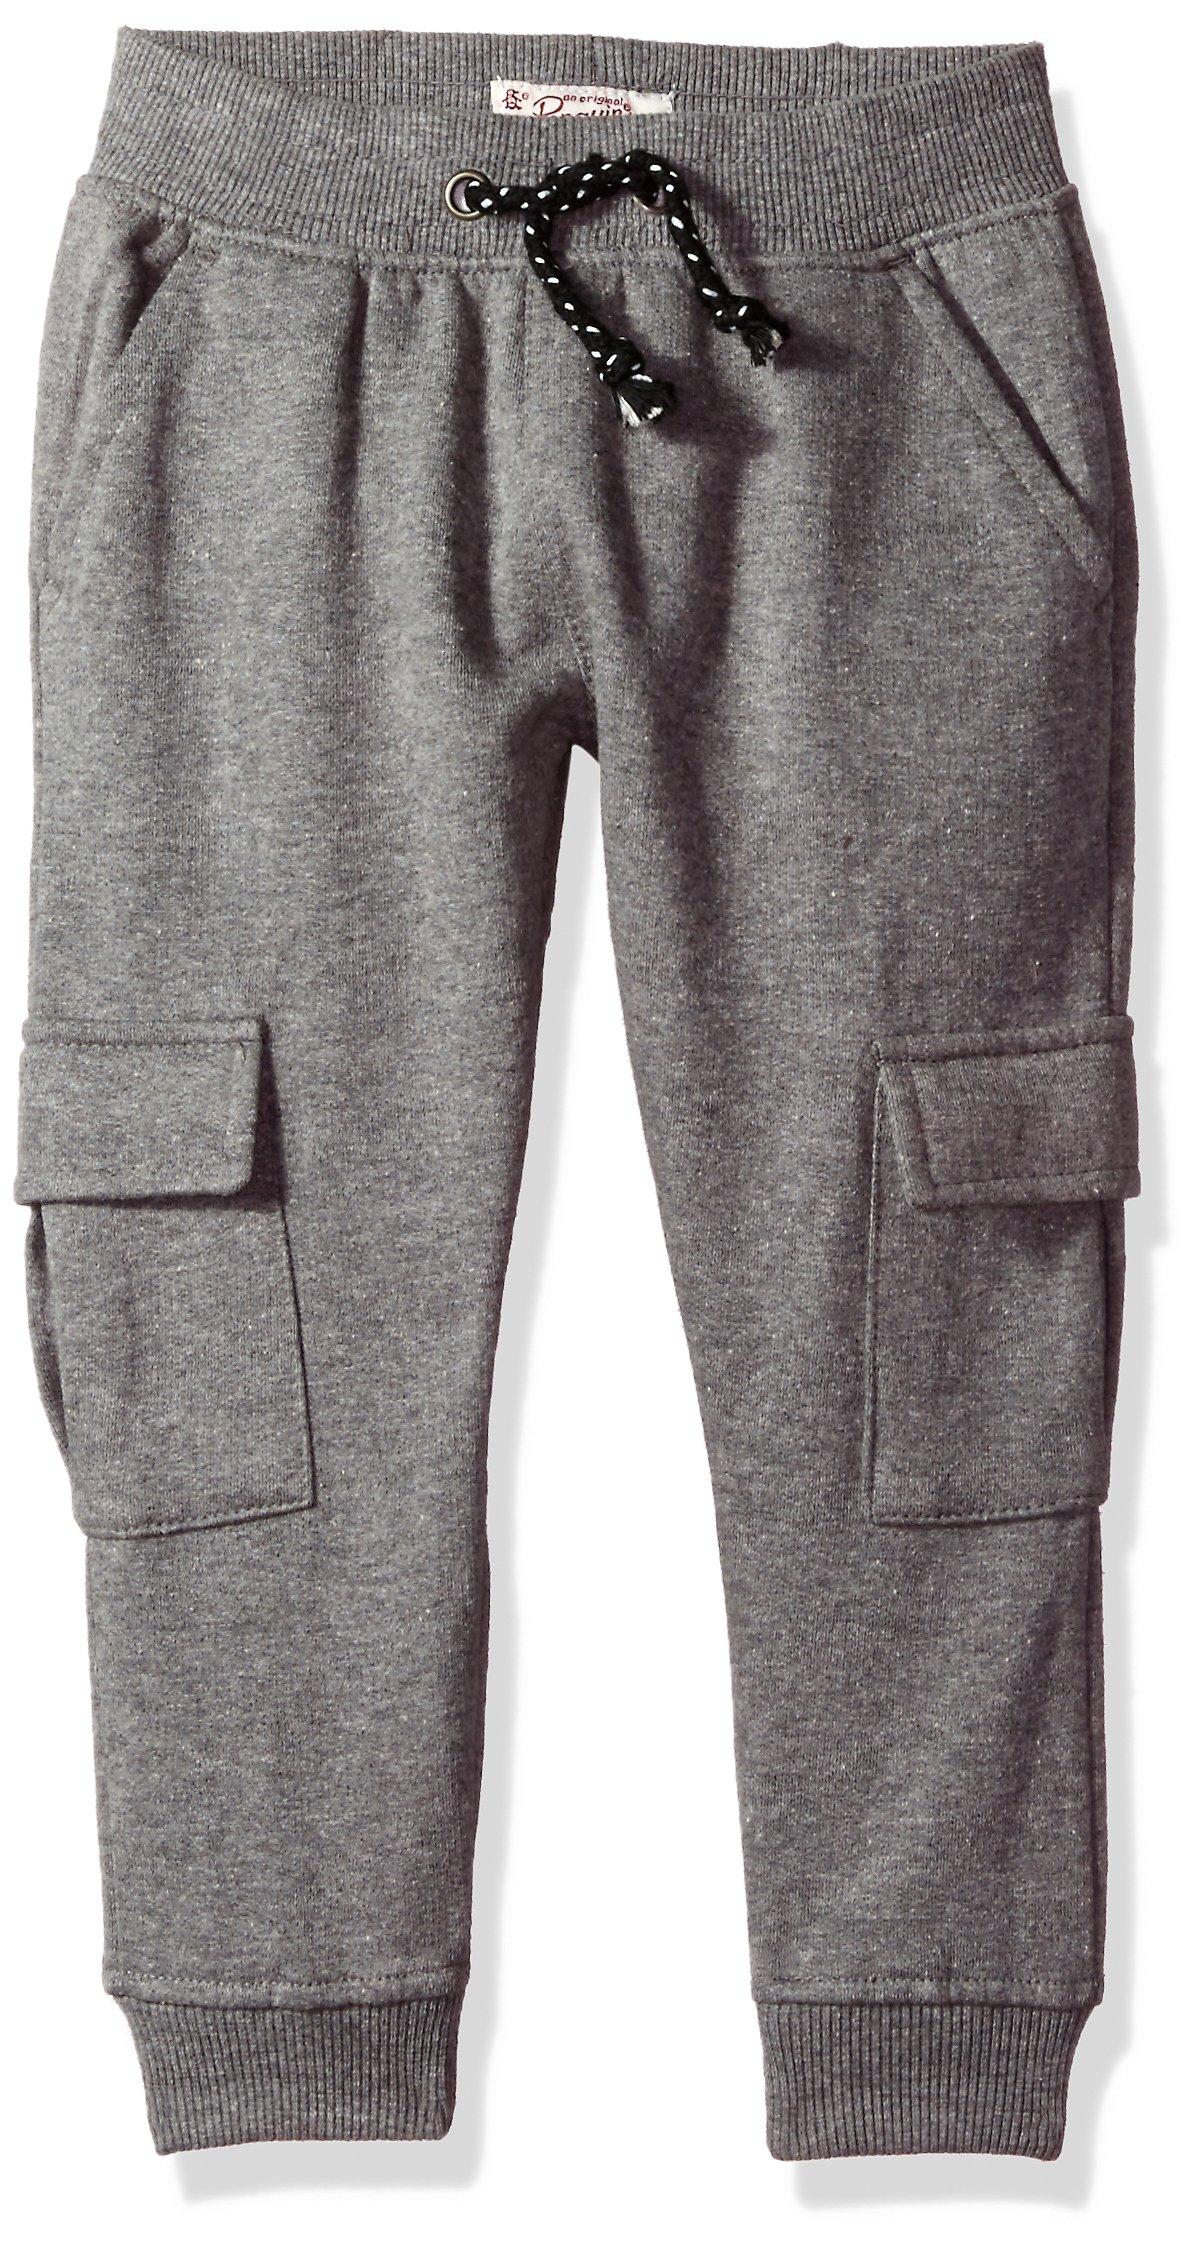 Penguin Little Boys' Fleece Pant (More Styles Available), Shark Heather, 6